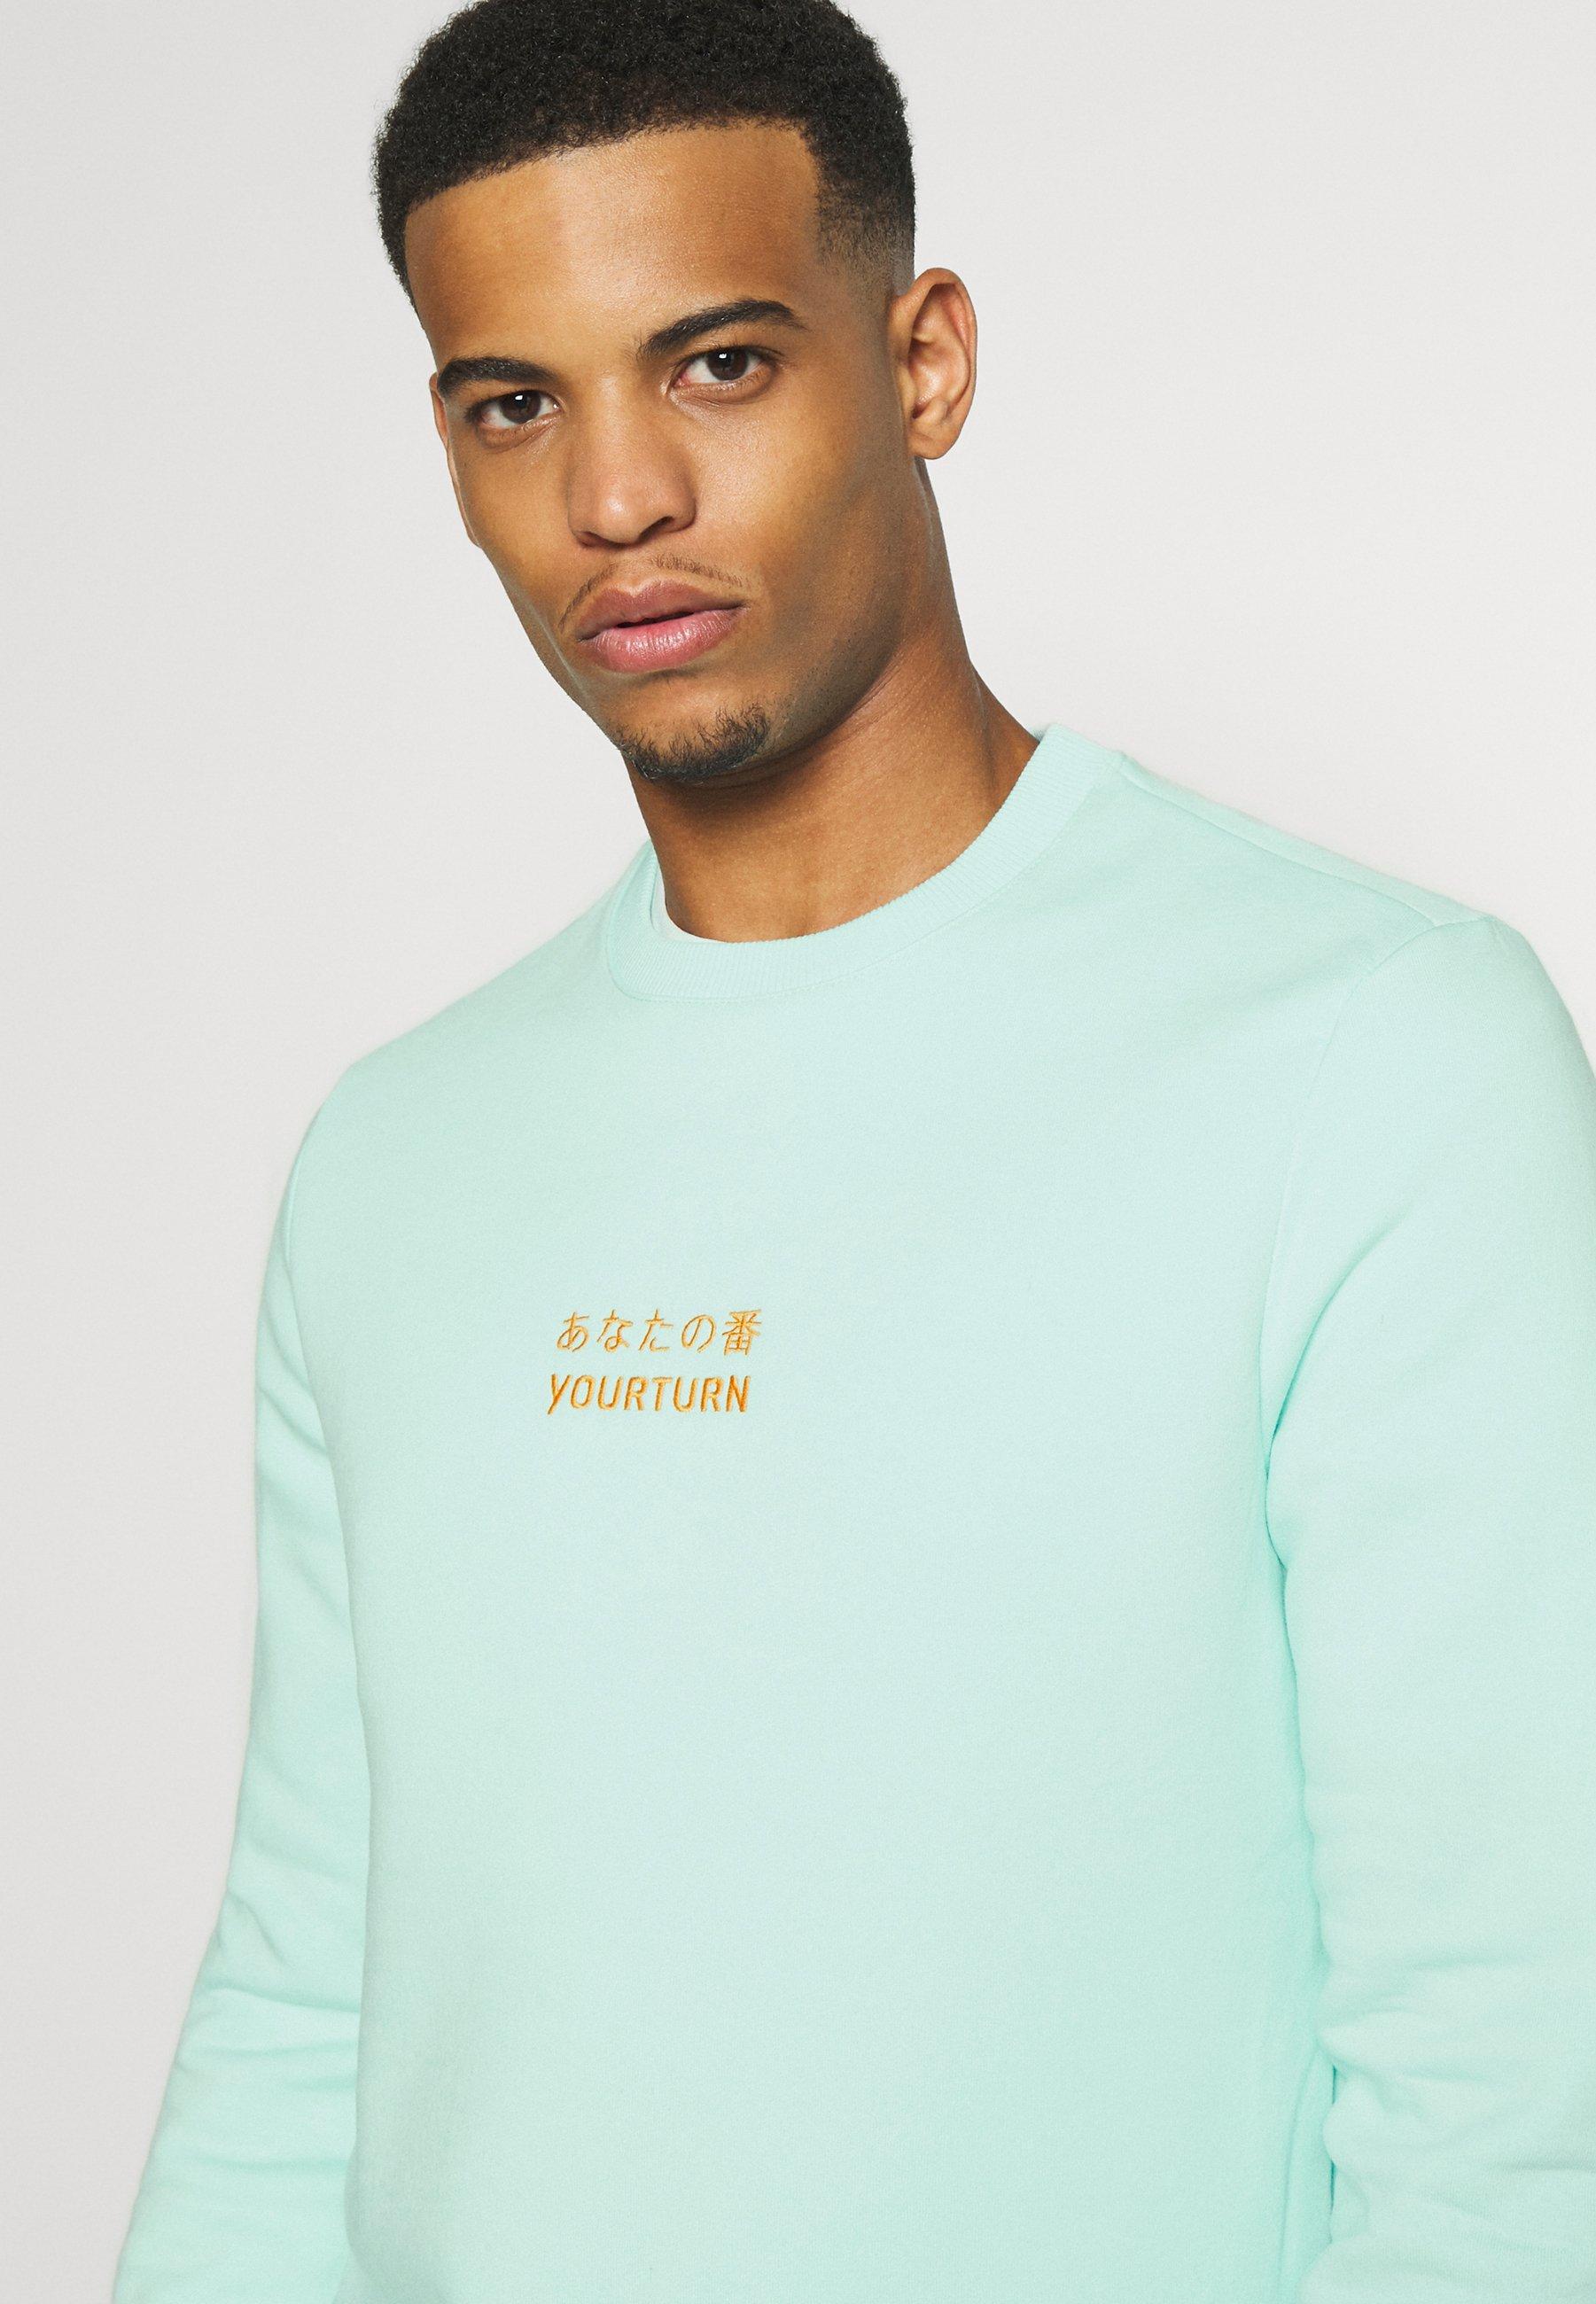 YOURTURN Sweatshirt - mint OQkGR